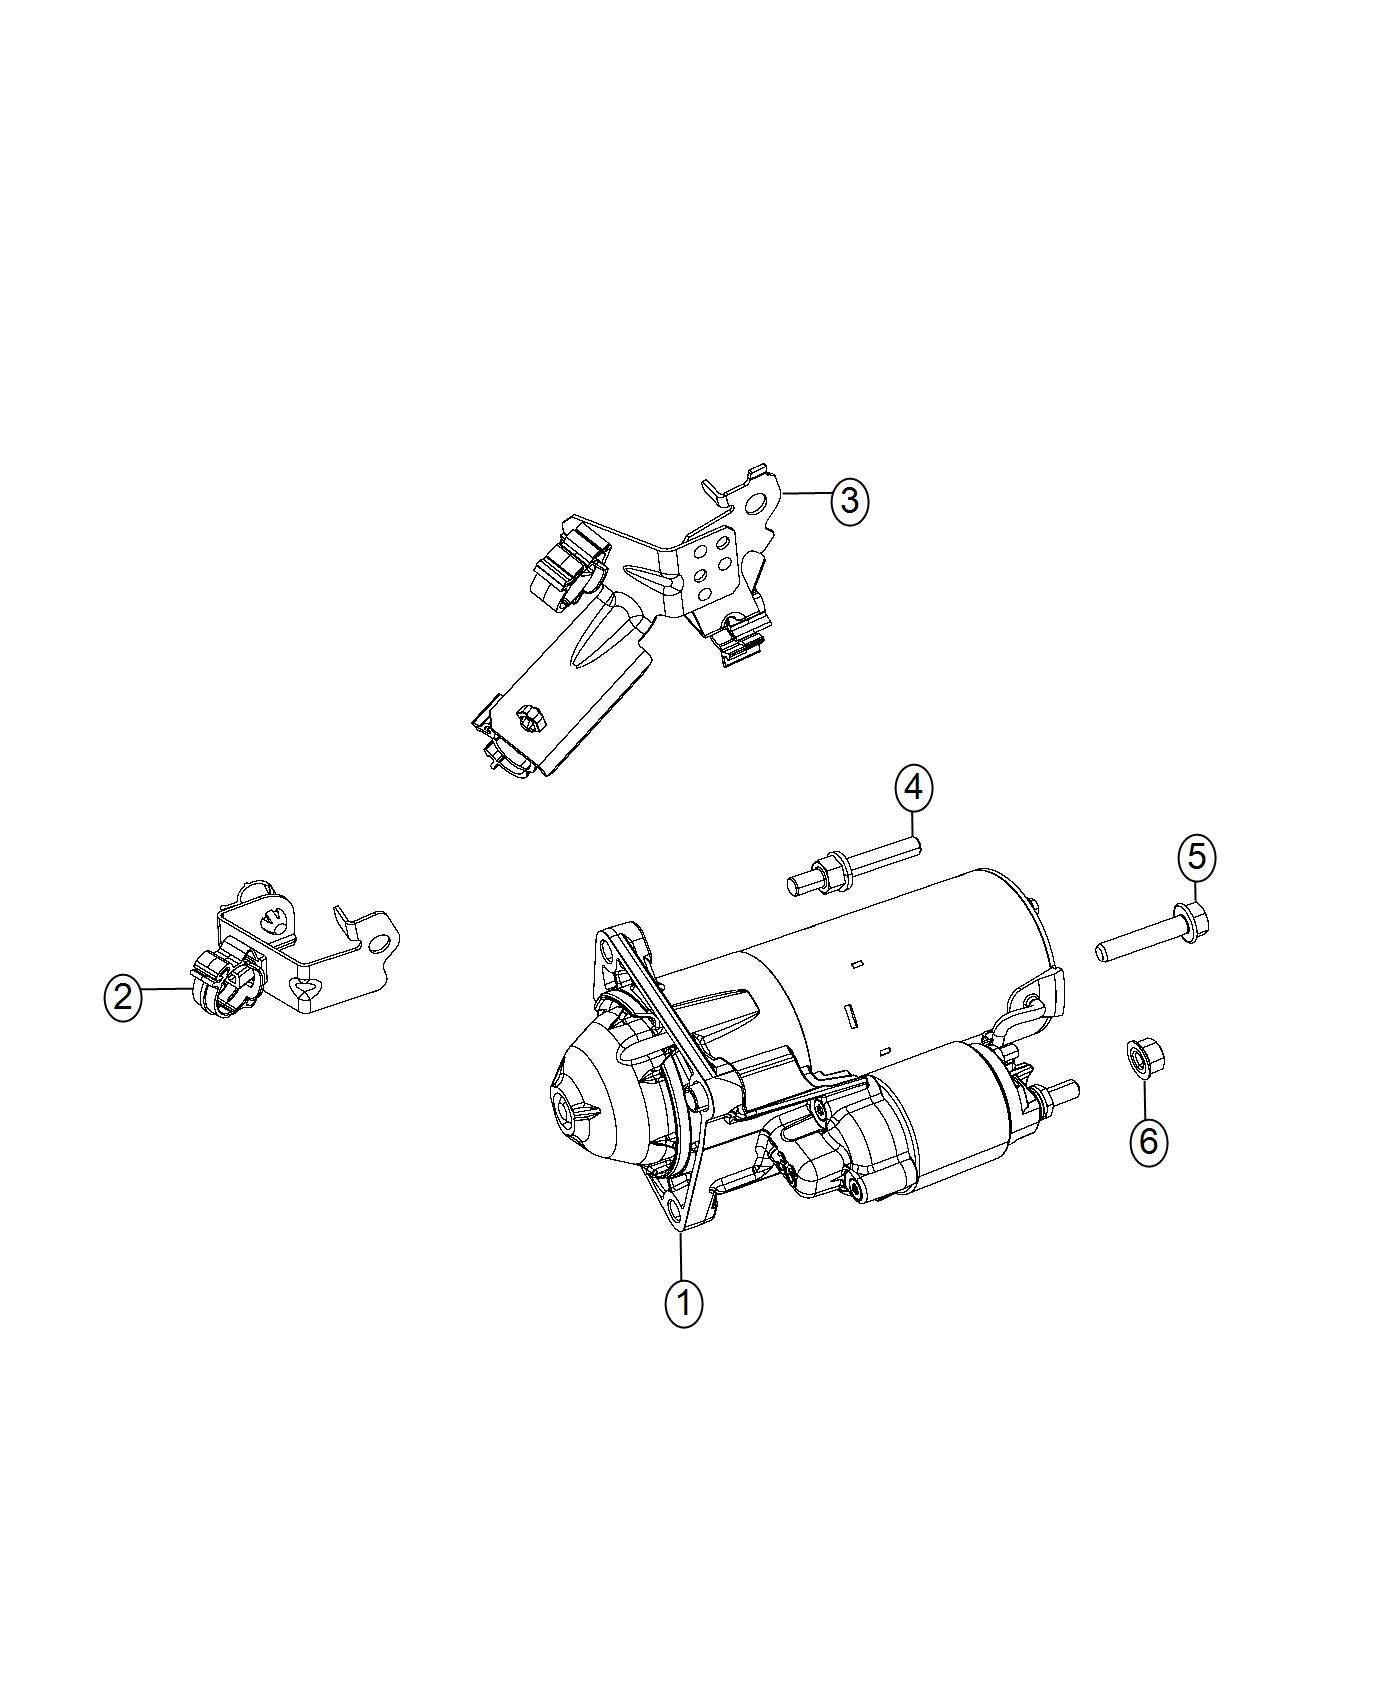 2017 Jeep Compass Starter. Engine. [power train parts